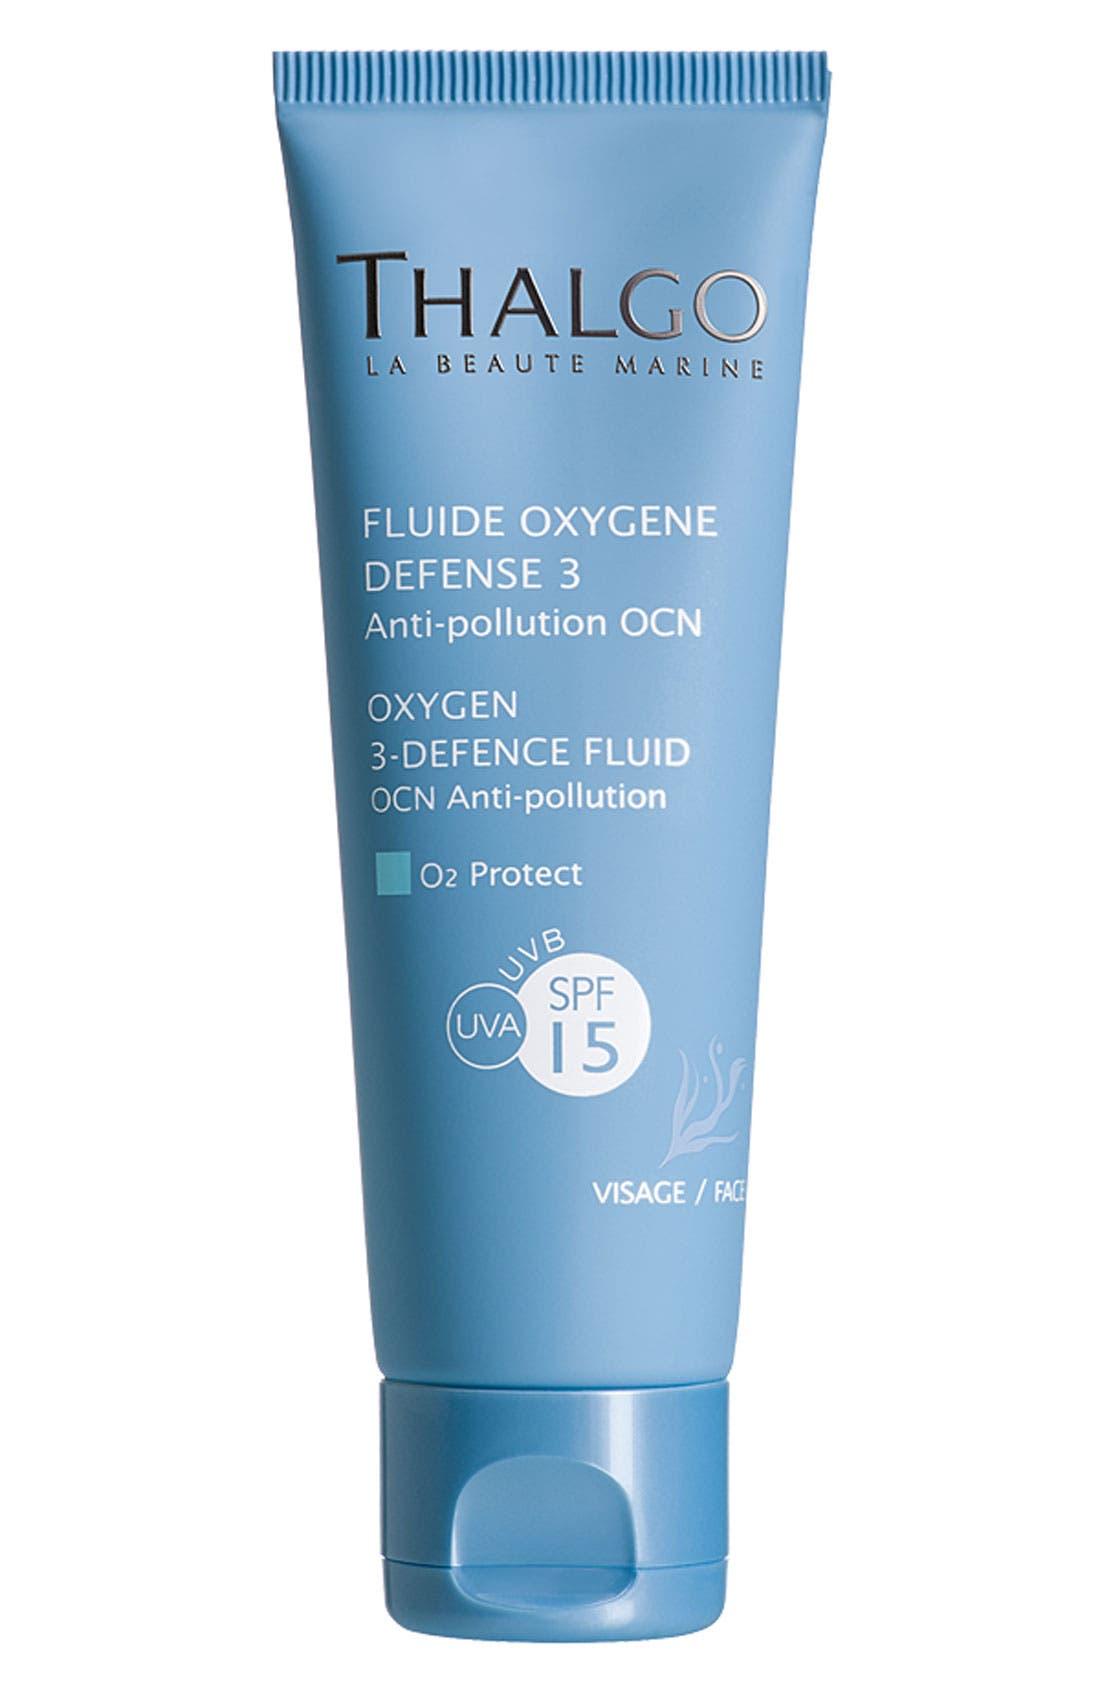 Thalgo 'Oxygen 3-Defence' Fluid SPF 15